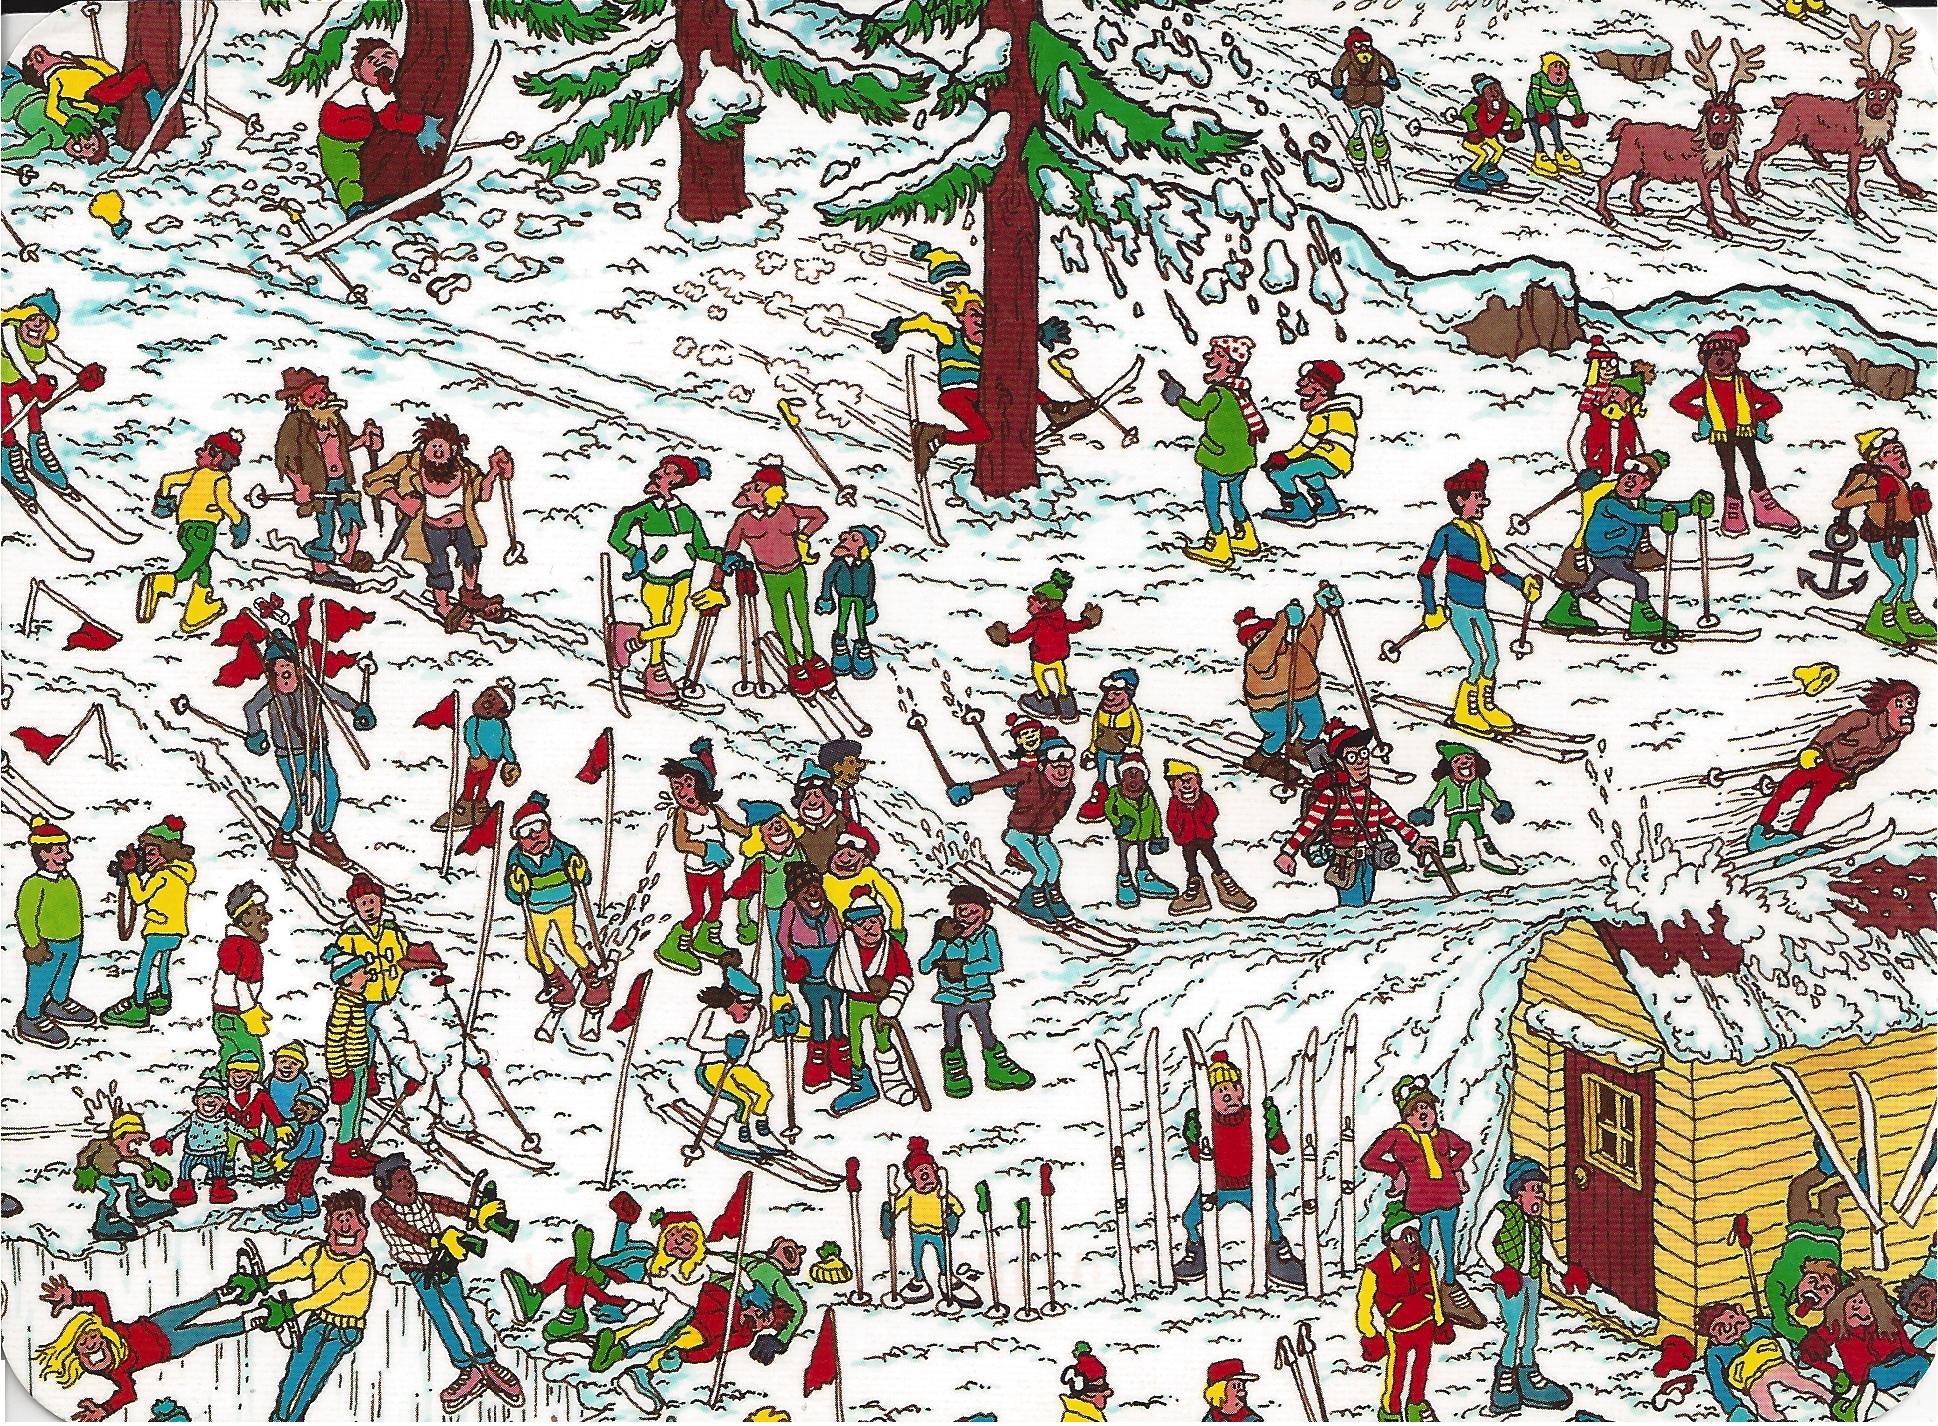 photo regarding Where's Waldo Pictures Printable referred to as 10 Wheres Waldo? High definition Wallpapers History Photos